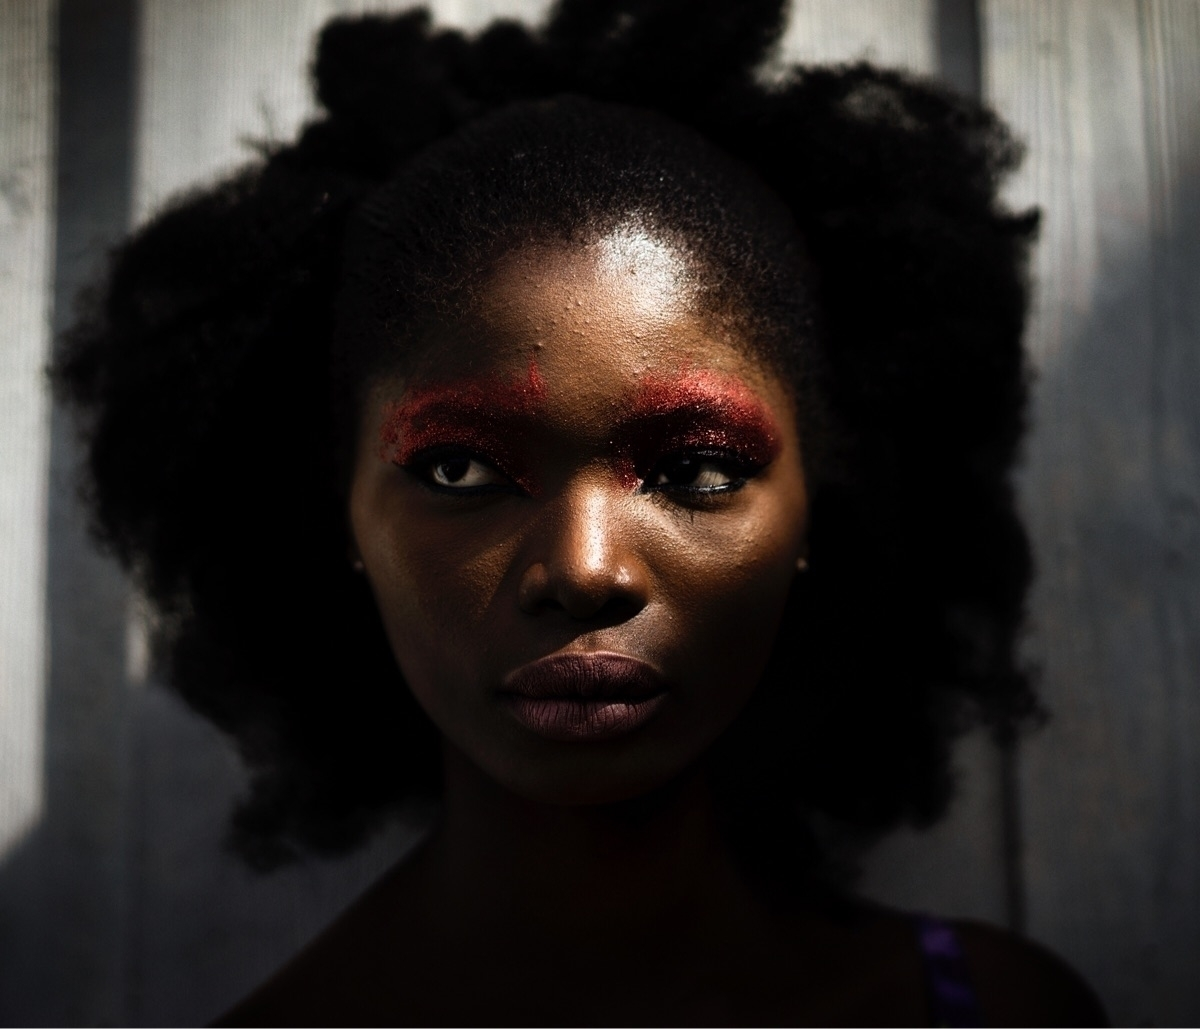 Medusa. Nigeria, 2017 - photojournalism - marcolongari | ello